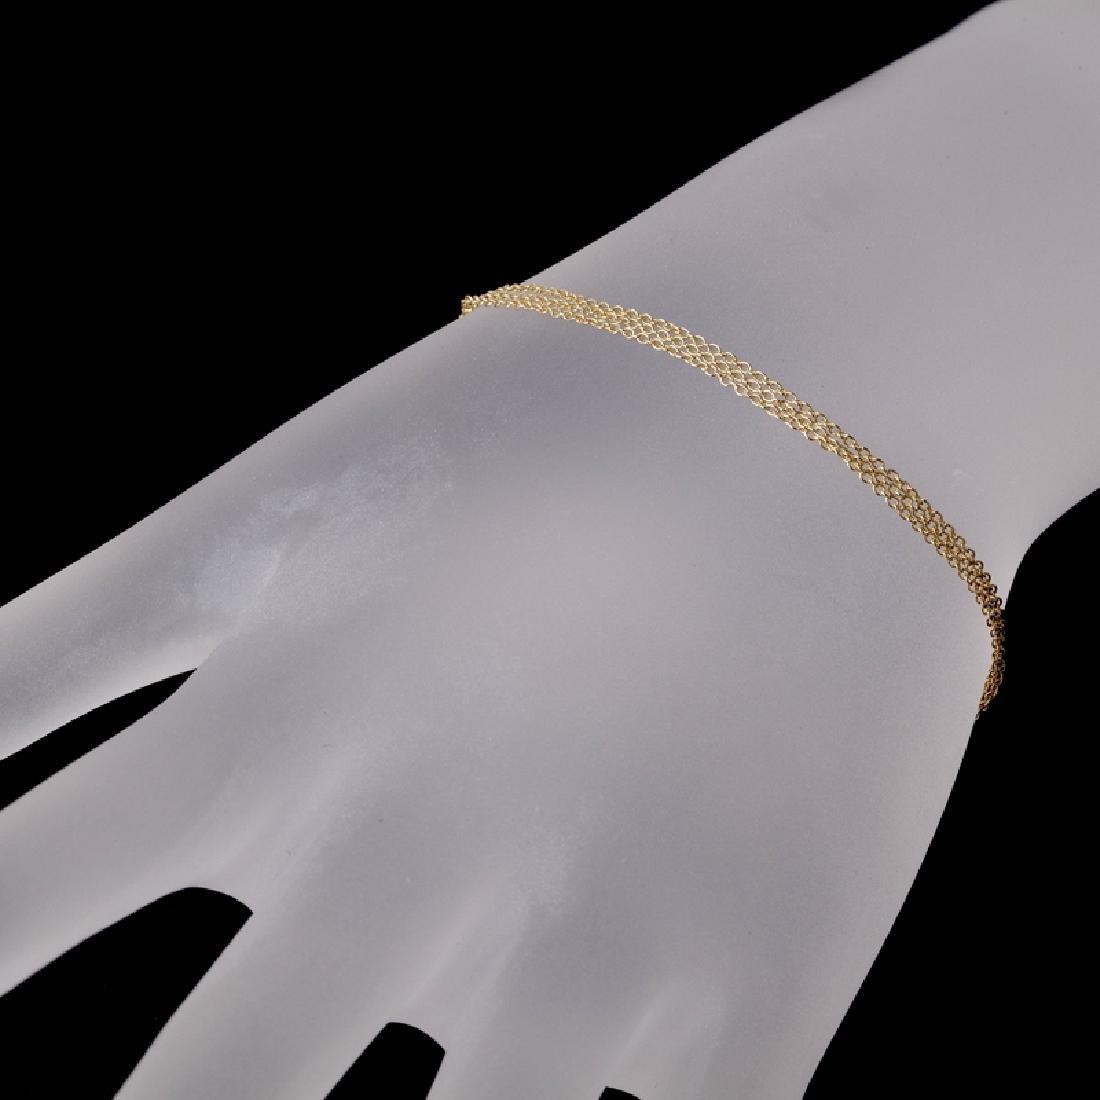 *Fine Jewelry 14 KT Gold, 3 Strand 1.5GR, 7'' Oval Link